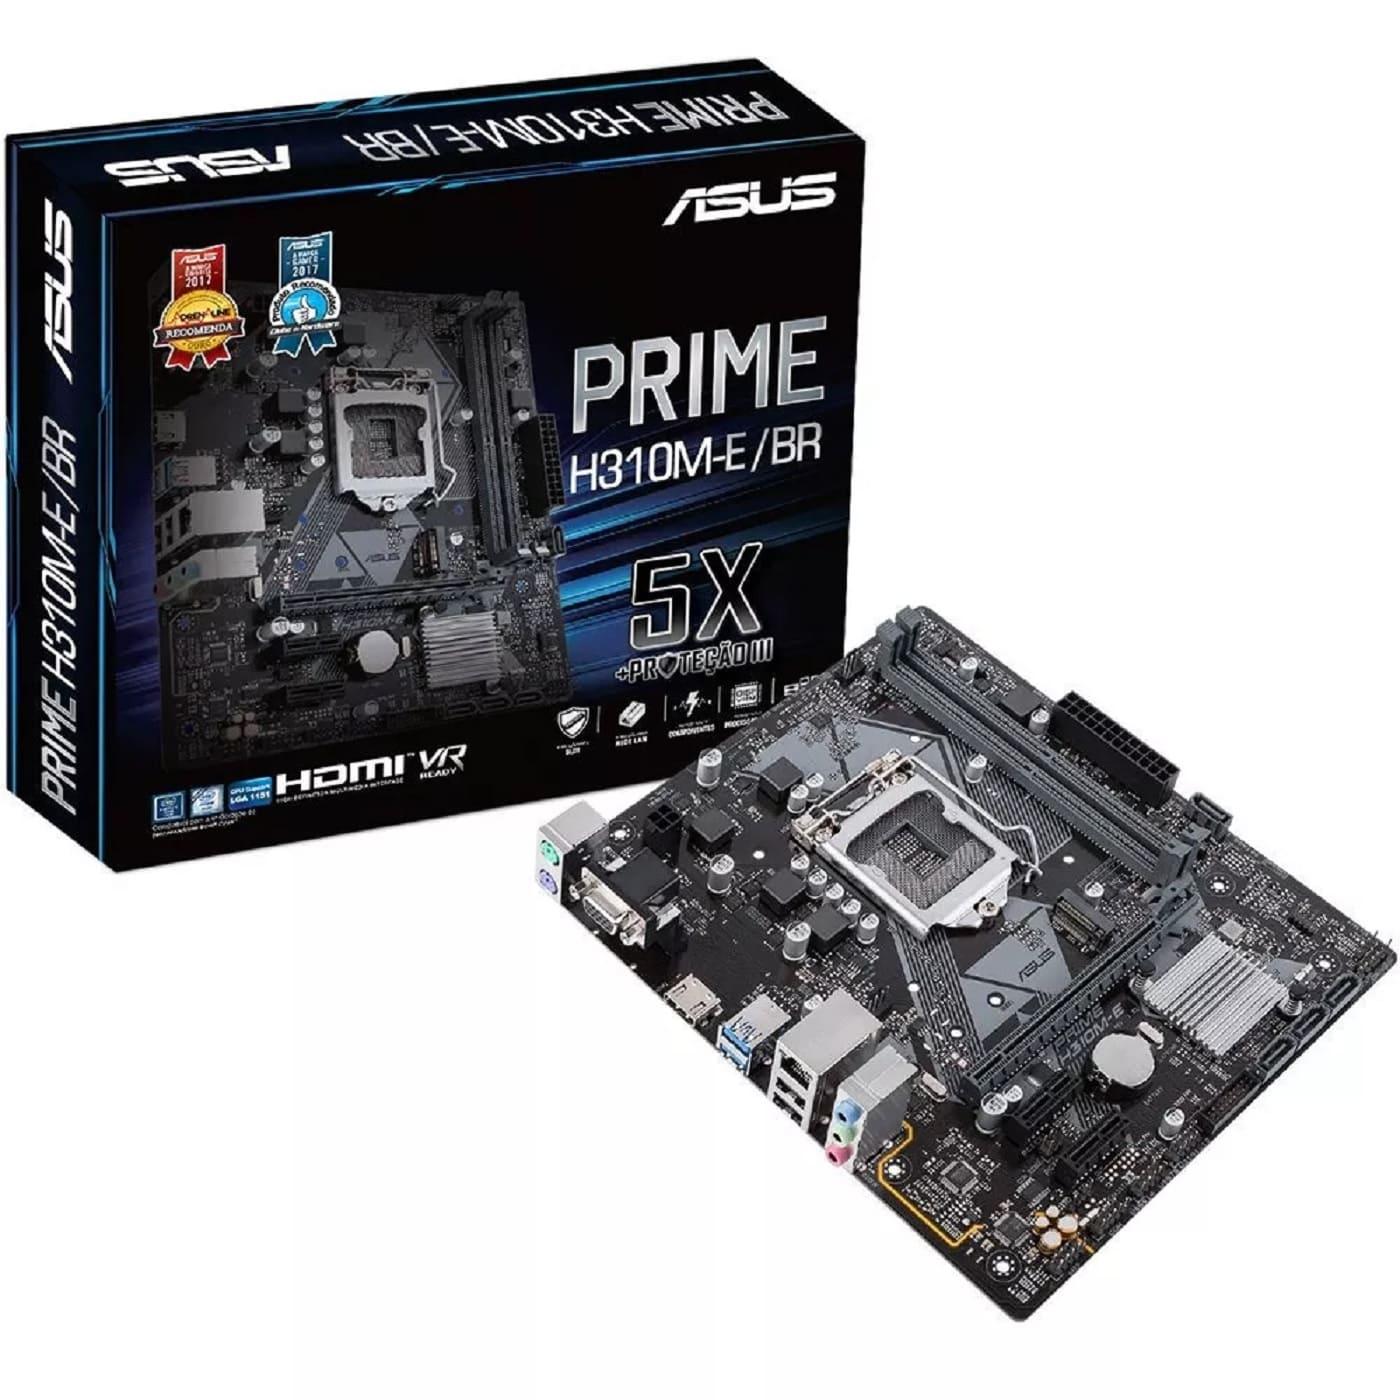 Placa Mãe Asus Intel LGA 1151 DDR4 8ª Geração Prime H310M-E/BR 90MB0Y30-C1BAY0